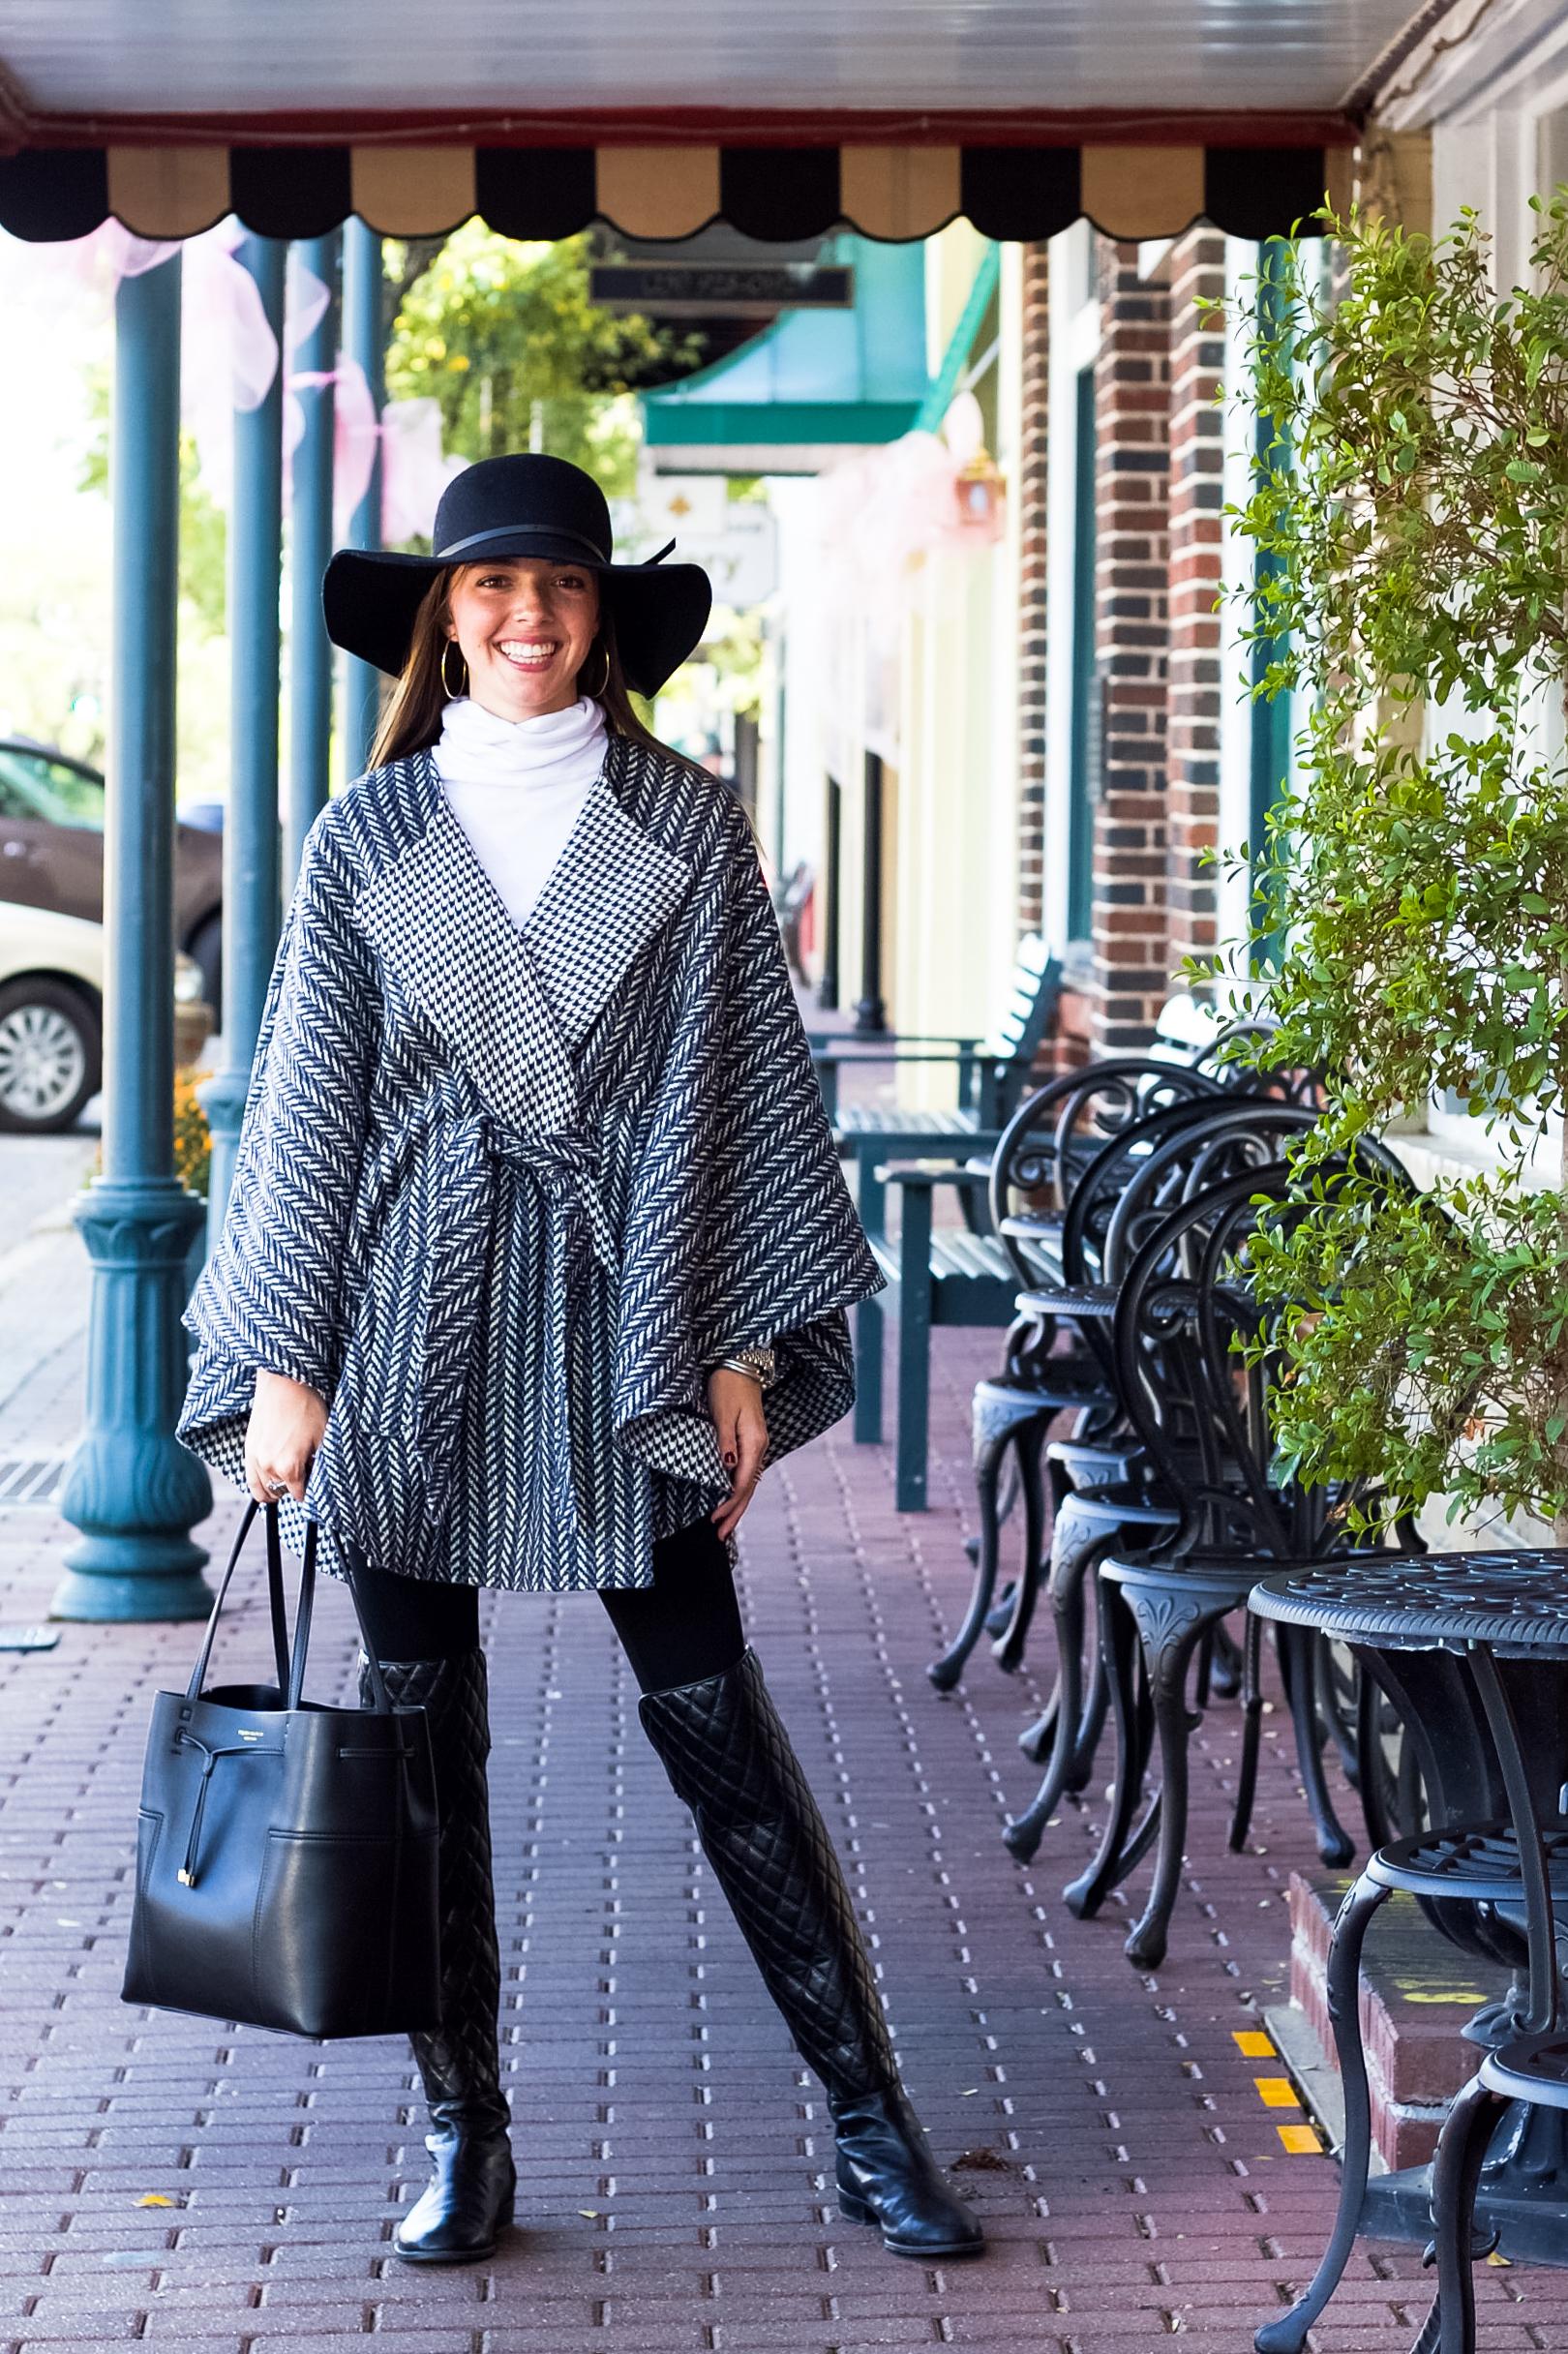 fashion-blogger-lcb-style-caroline-bramlett-draper-james-reese-witherspoon-fairhope-alabama-1-of-43